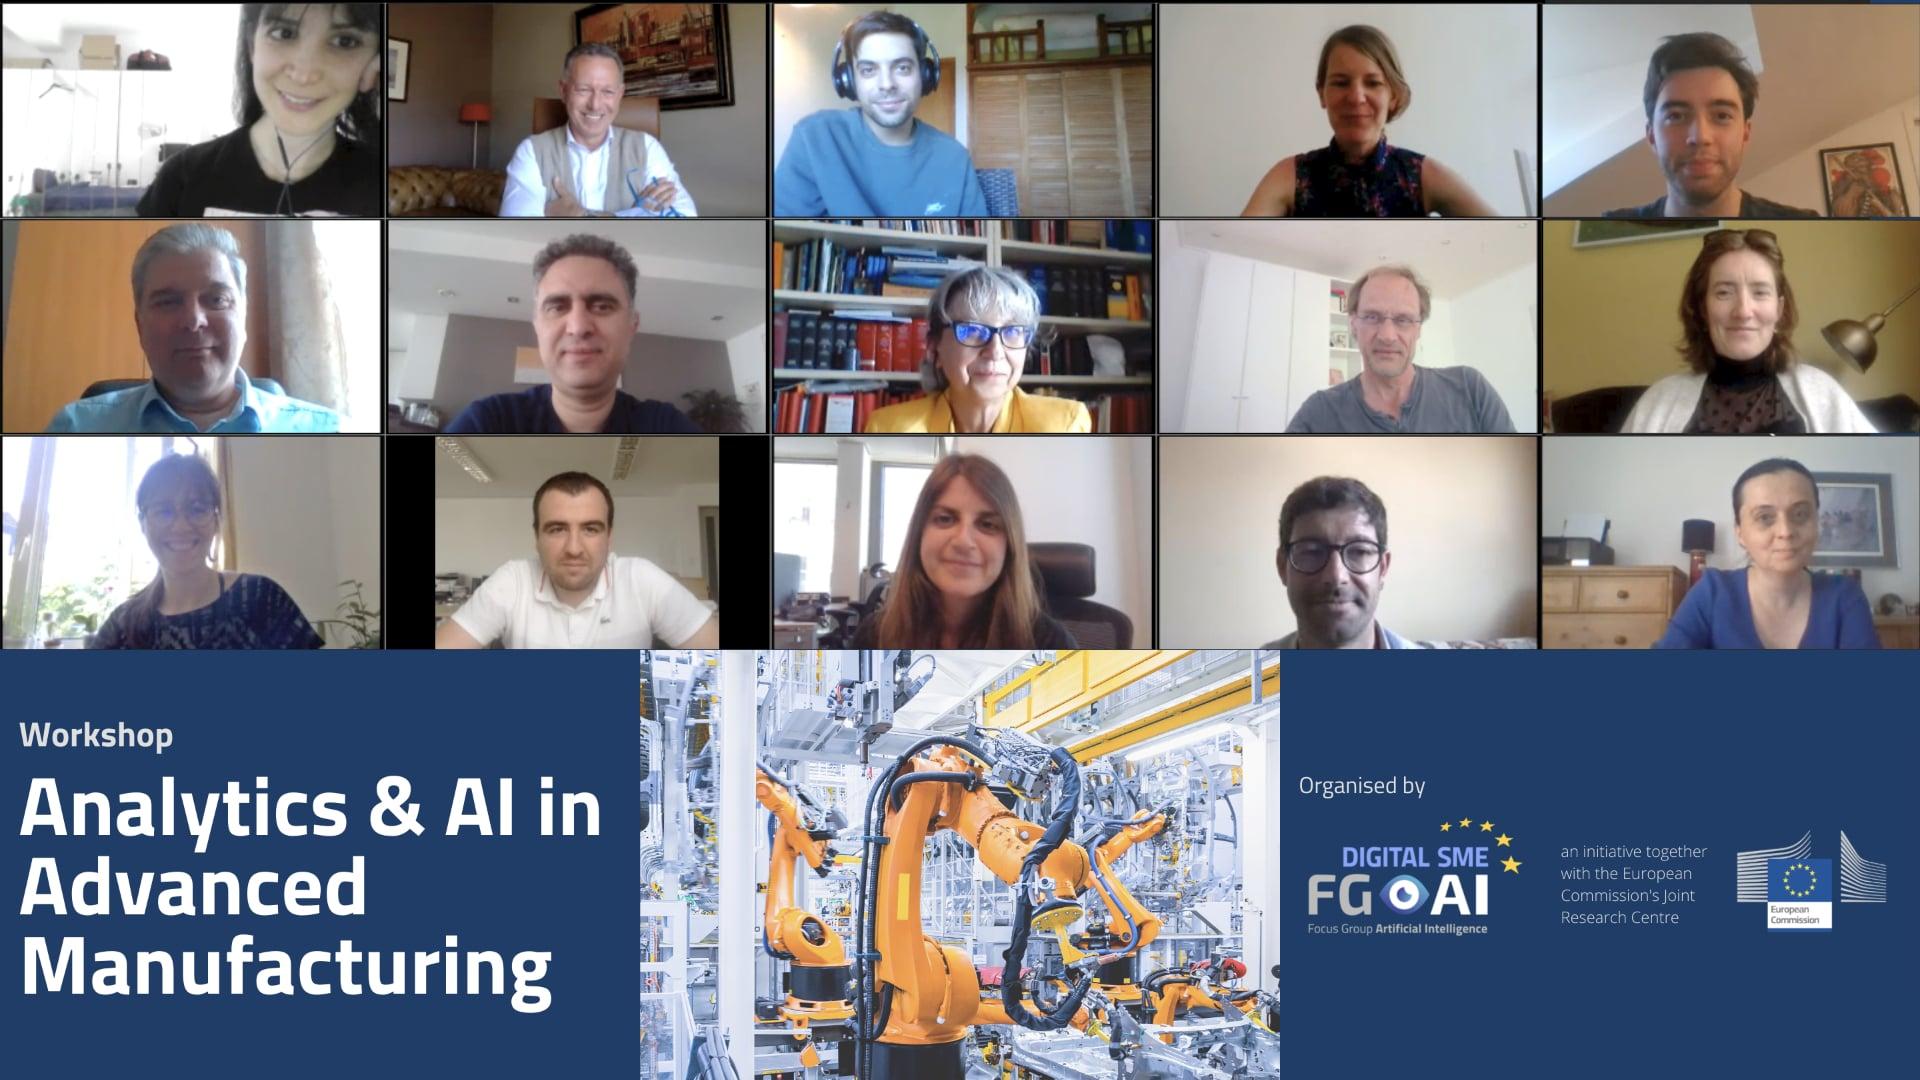 Analytics & AI in Advanced Manufacturing – Workshop